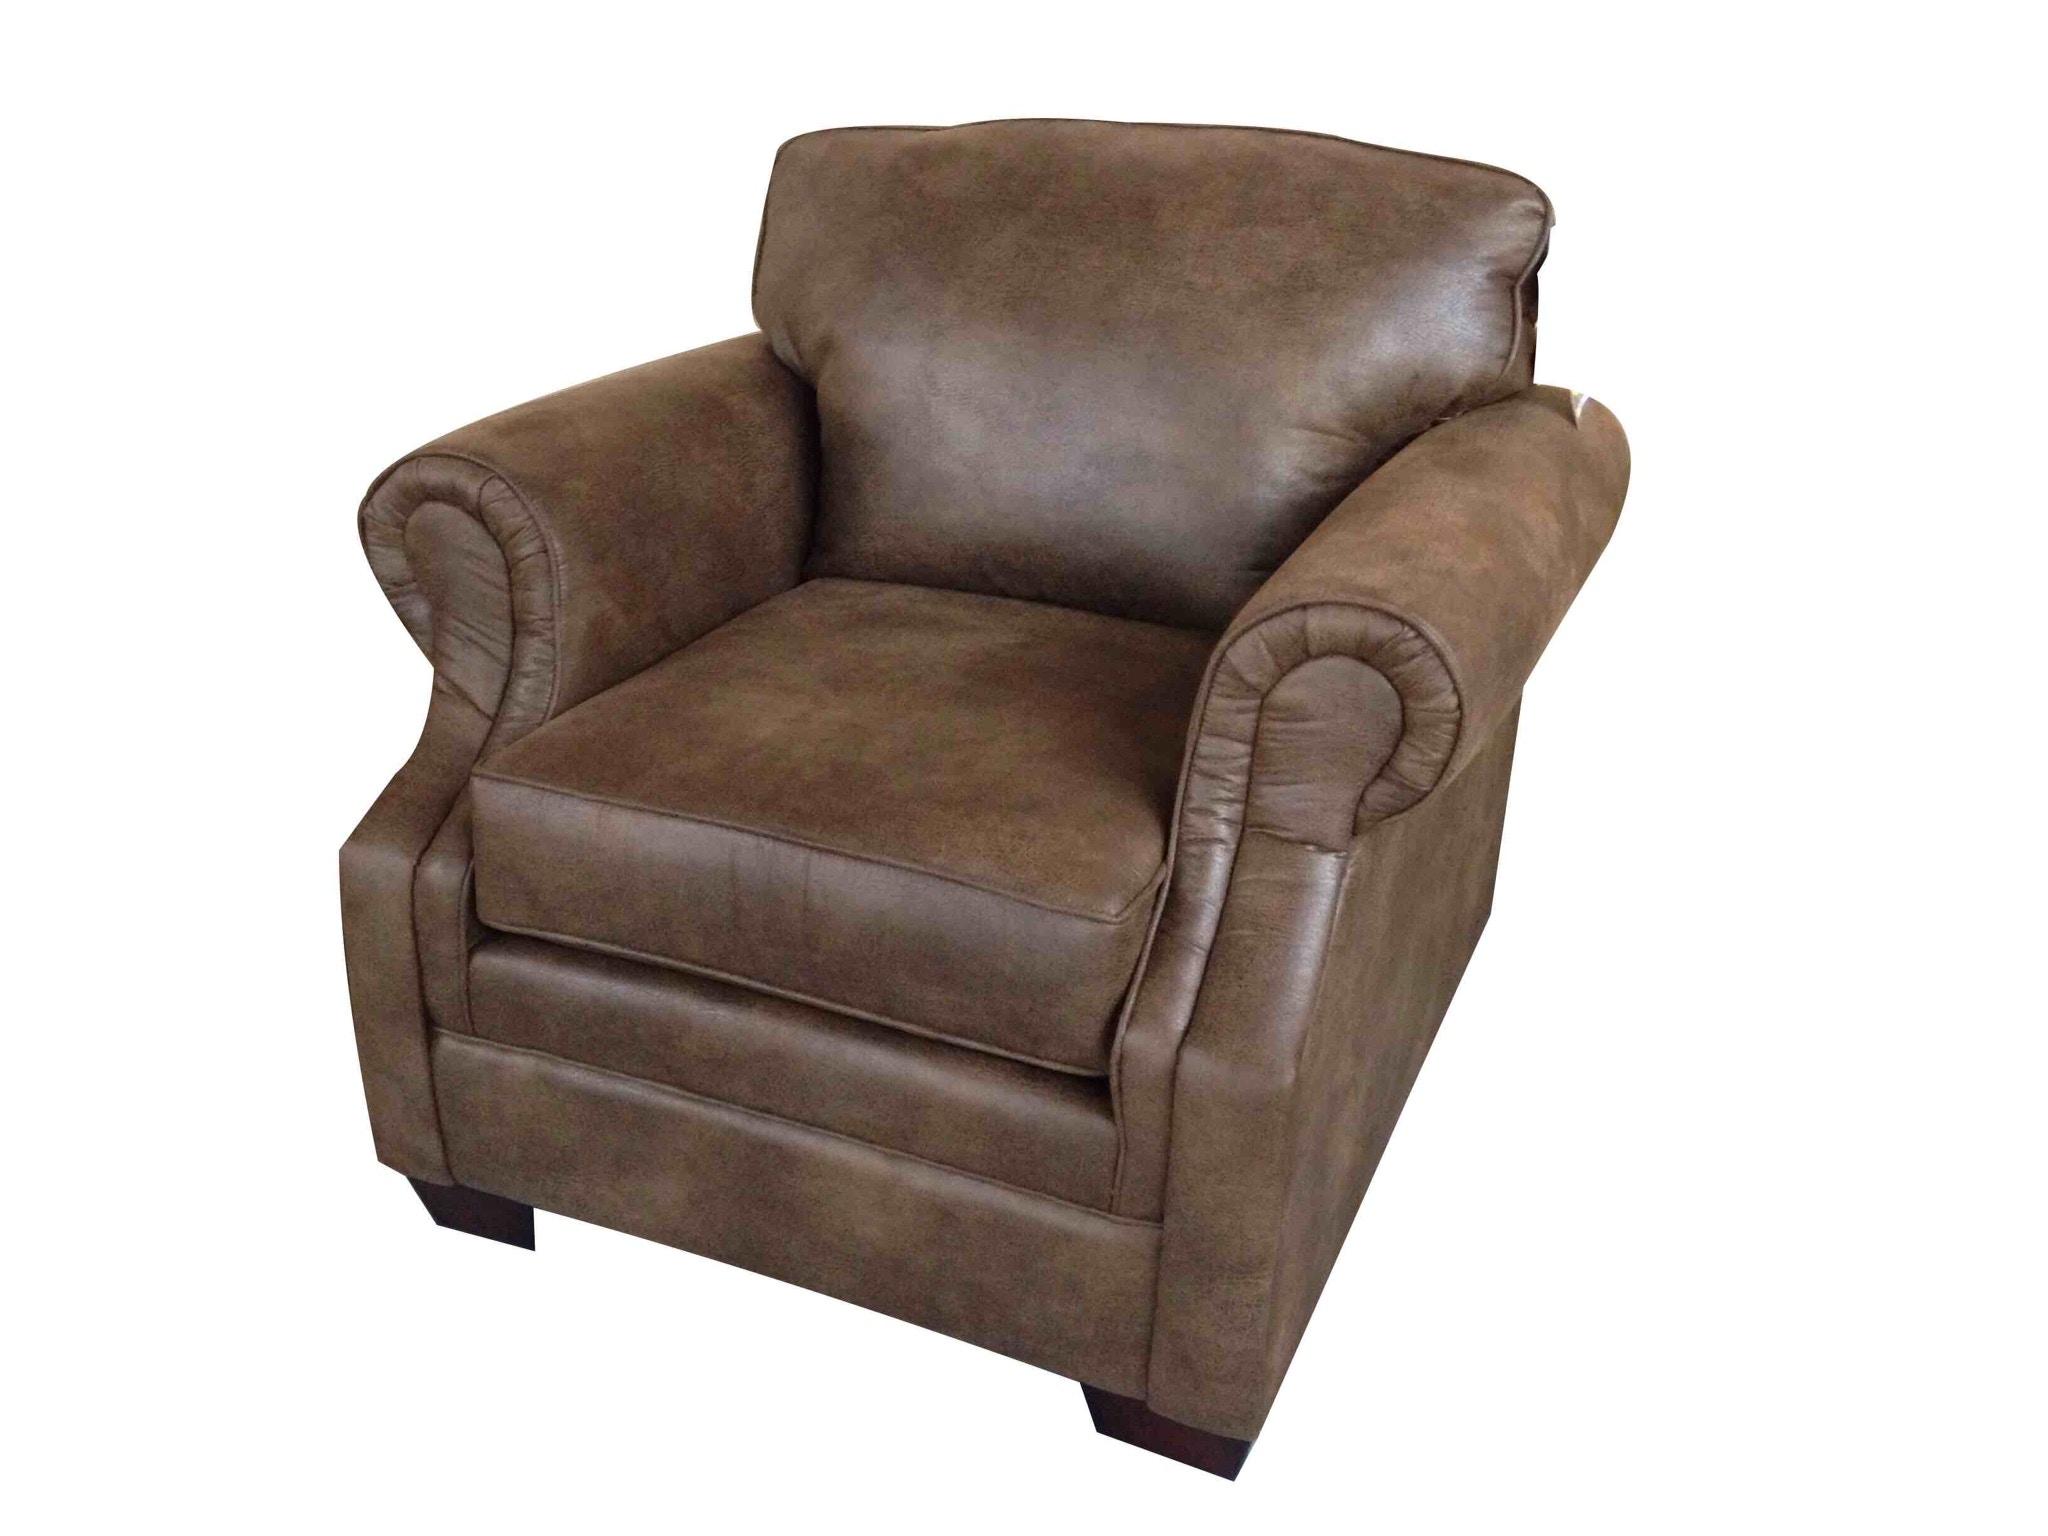 Awesome Bayne Rustic Chair 910 1